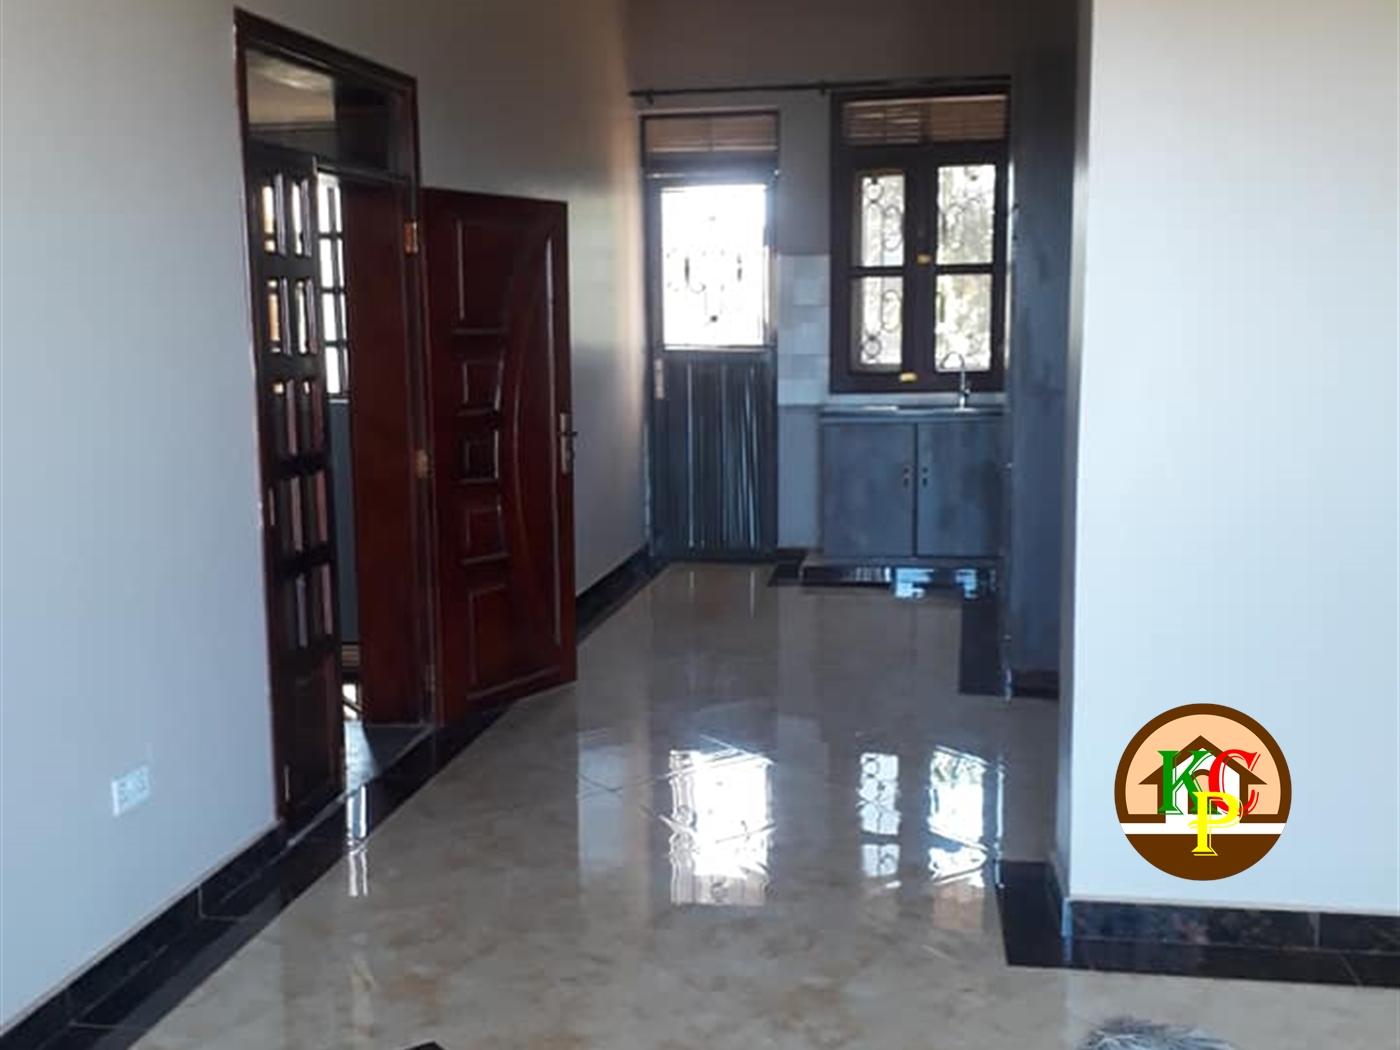 Apartment for rent in Kitubulu Wakiso